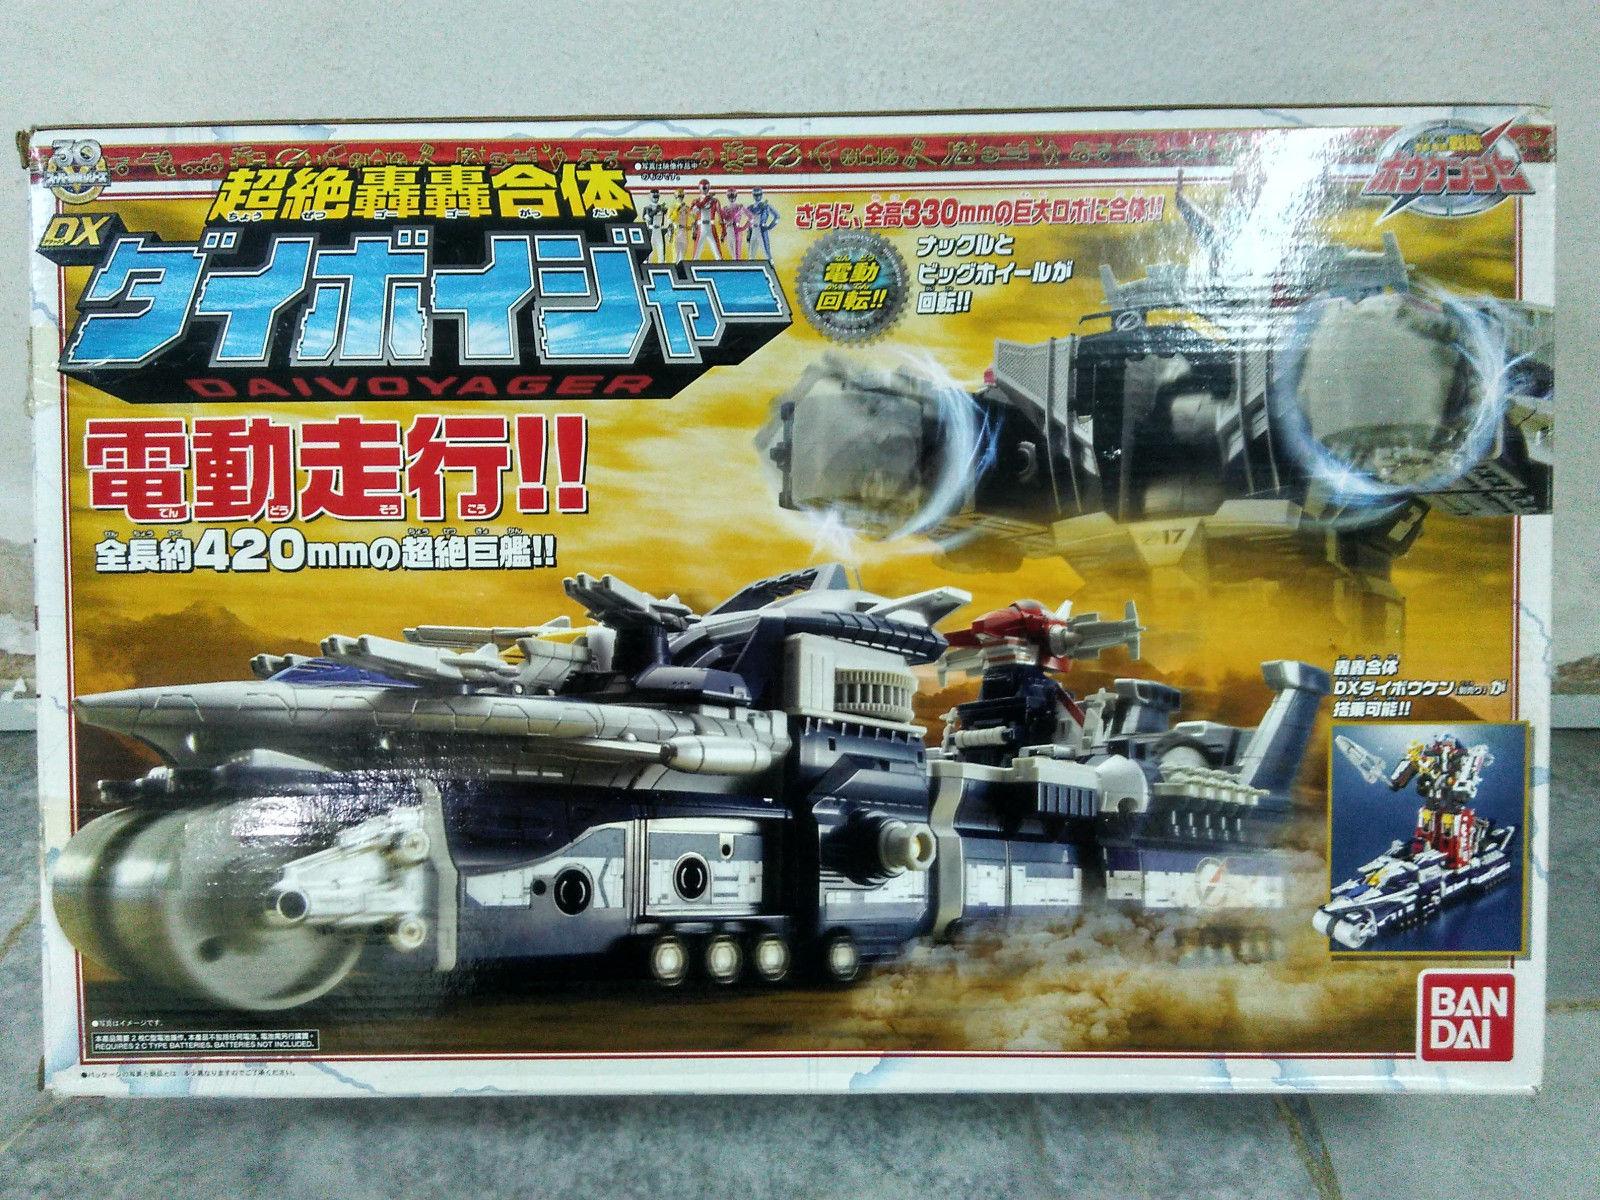 2007 Bandai Power Rangers Operation Overdrive Battlefleet Megazord 1600x1200